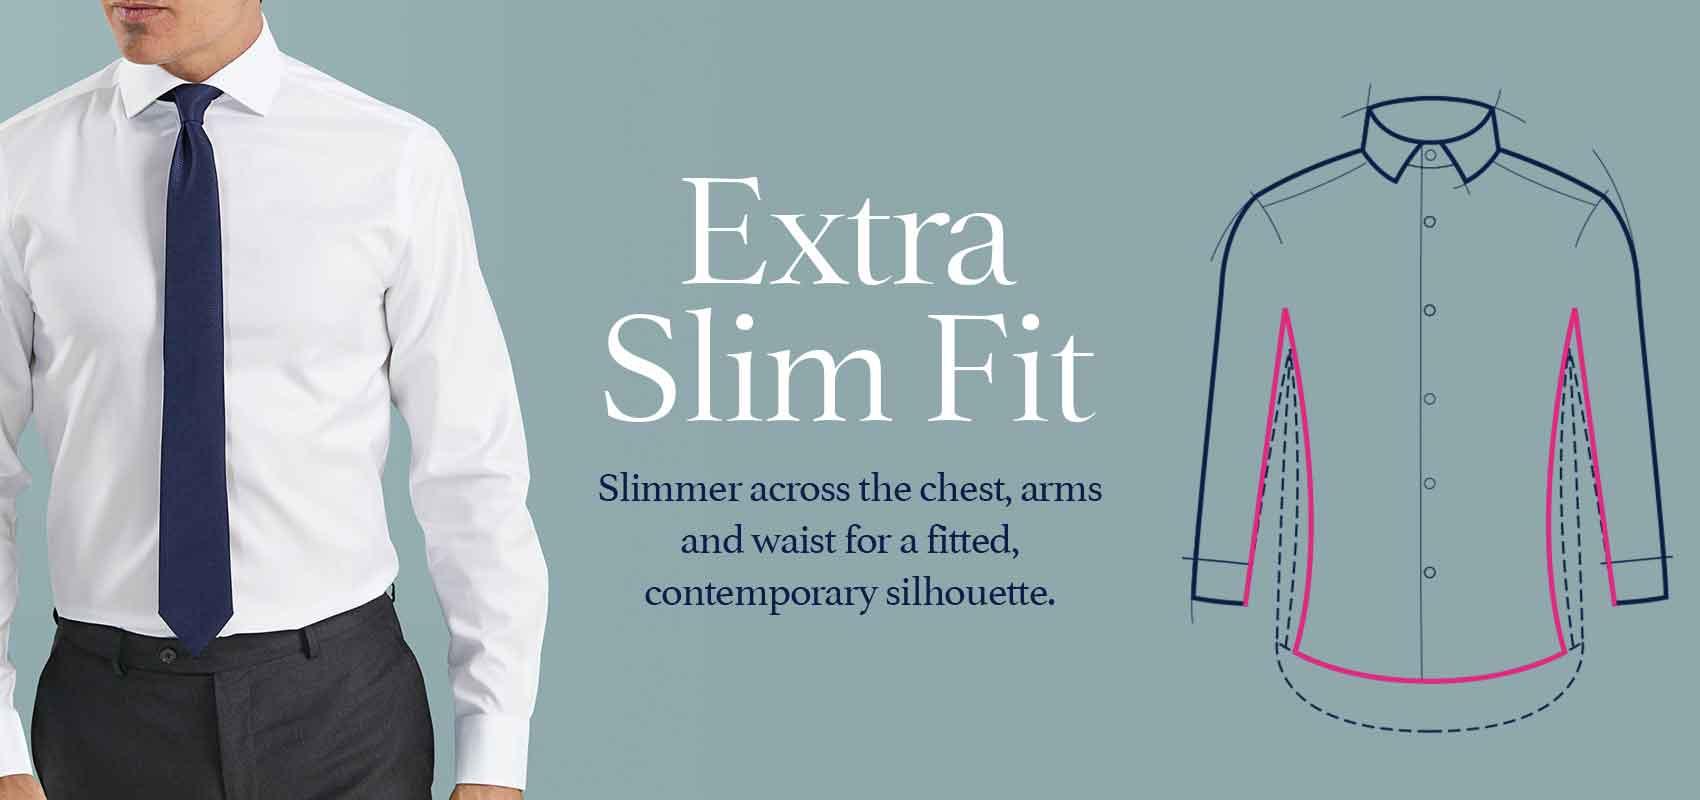 Extra slim fit shirts